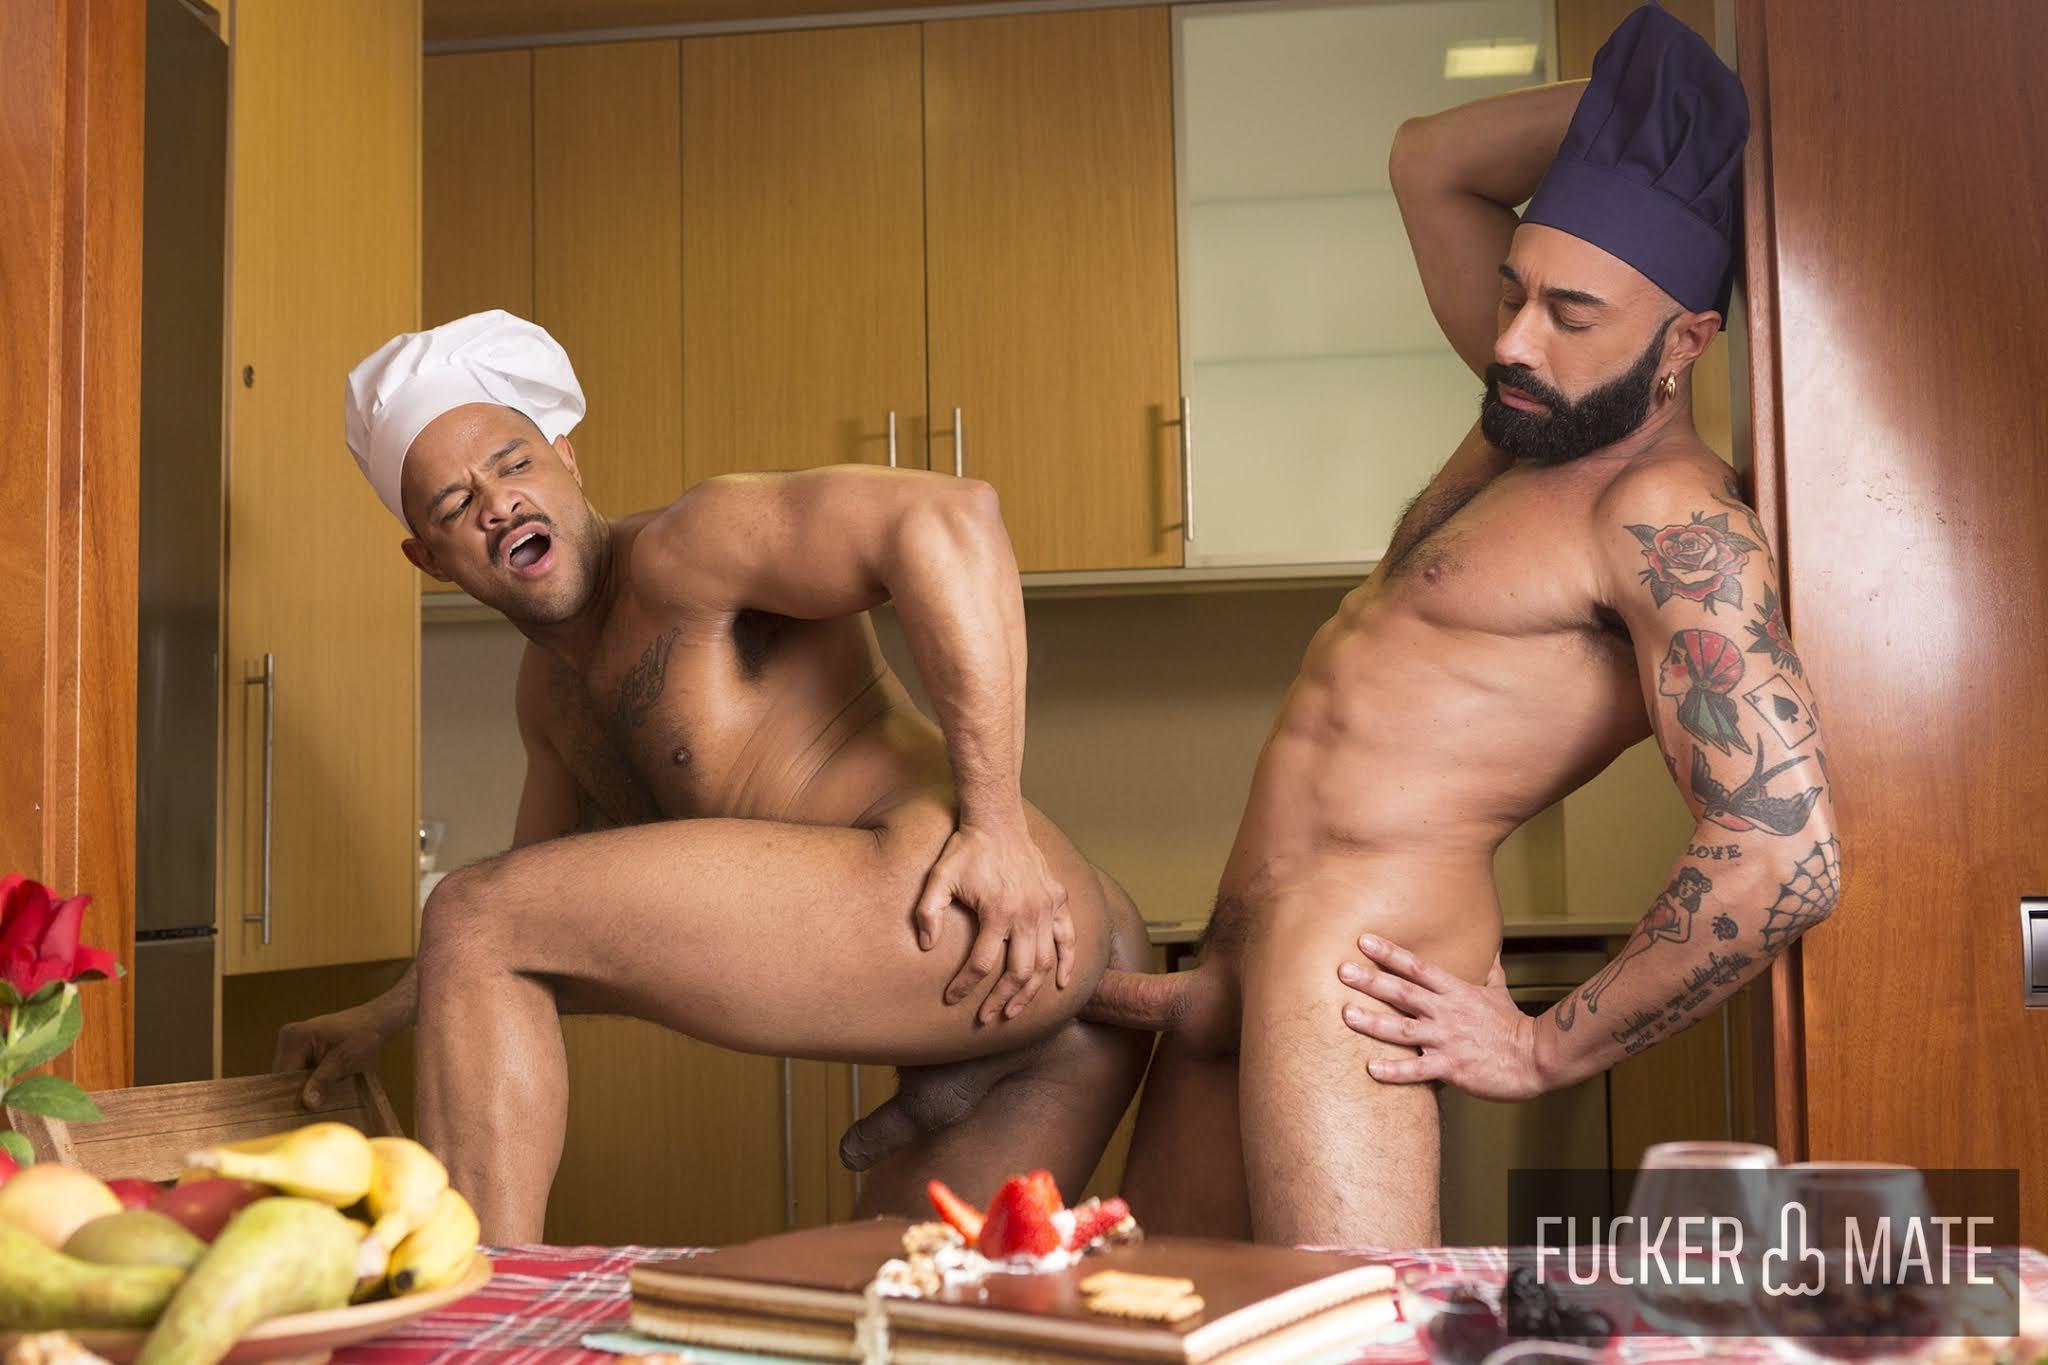 negro y chef, sexo